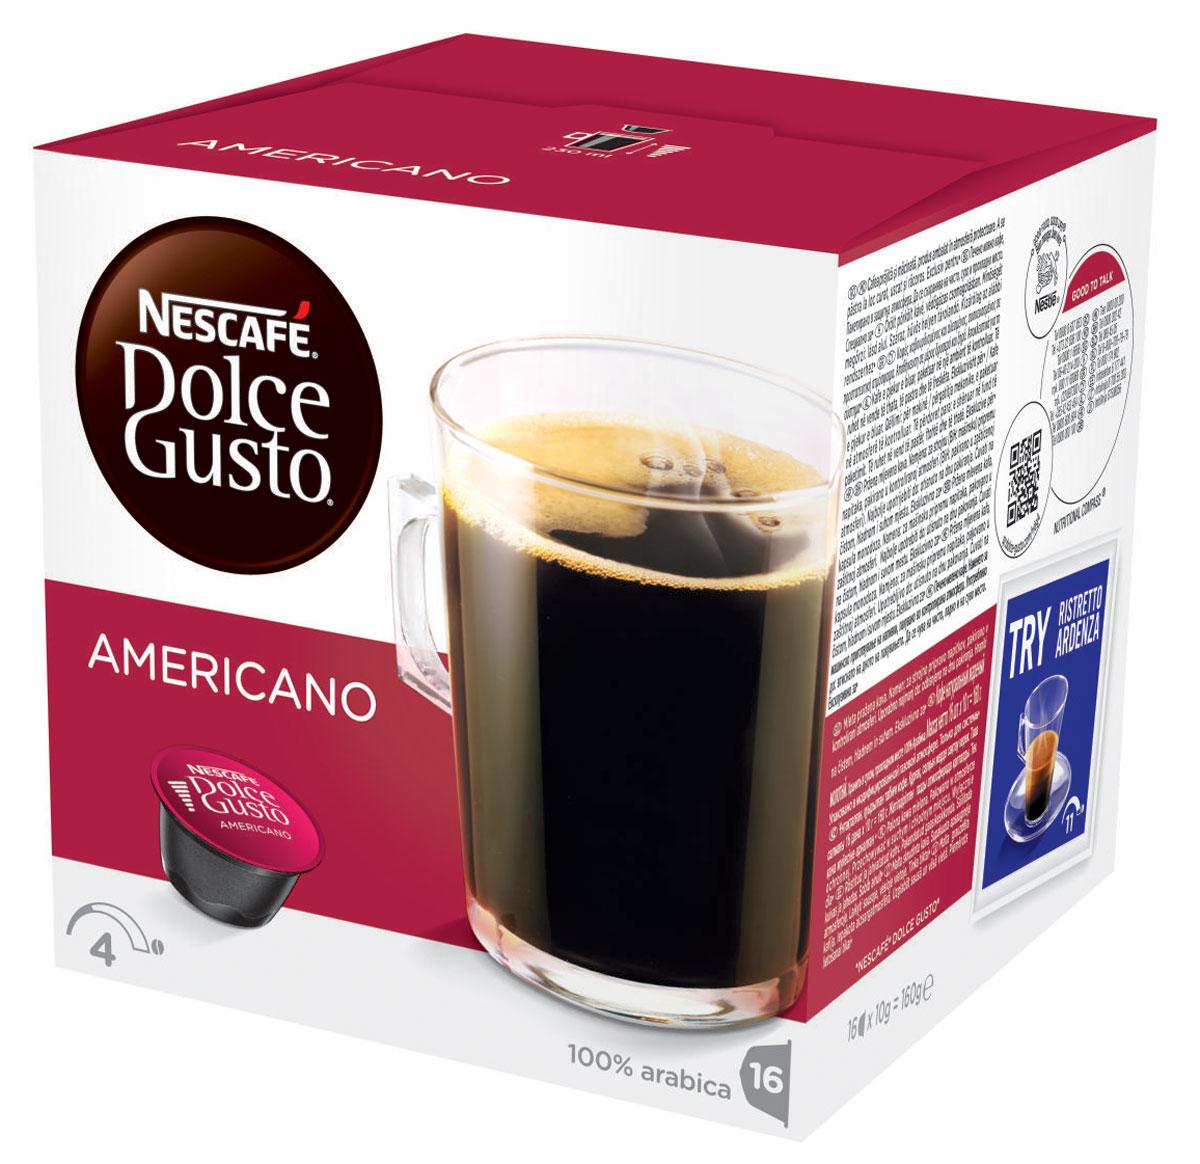 Nescafe Dolce Gusto Americano кофе в капсулах, 16 шт удачного дня 870775